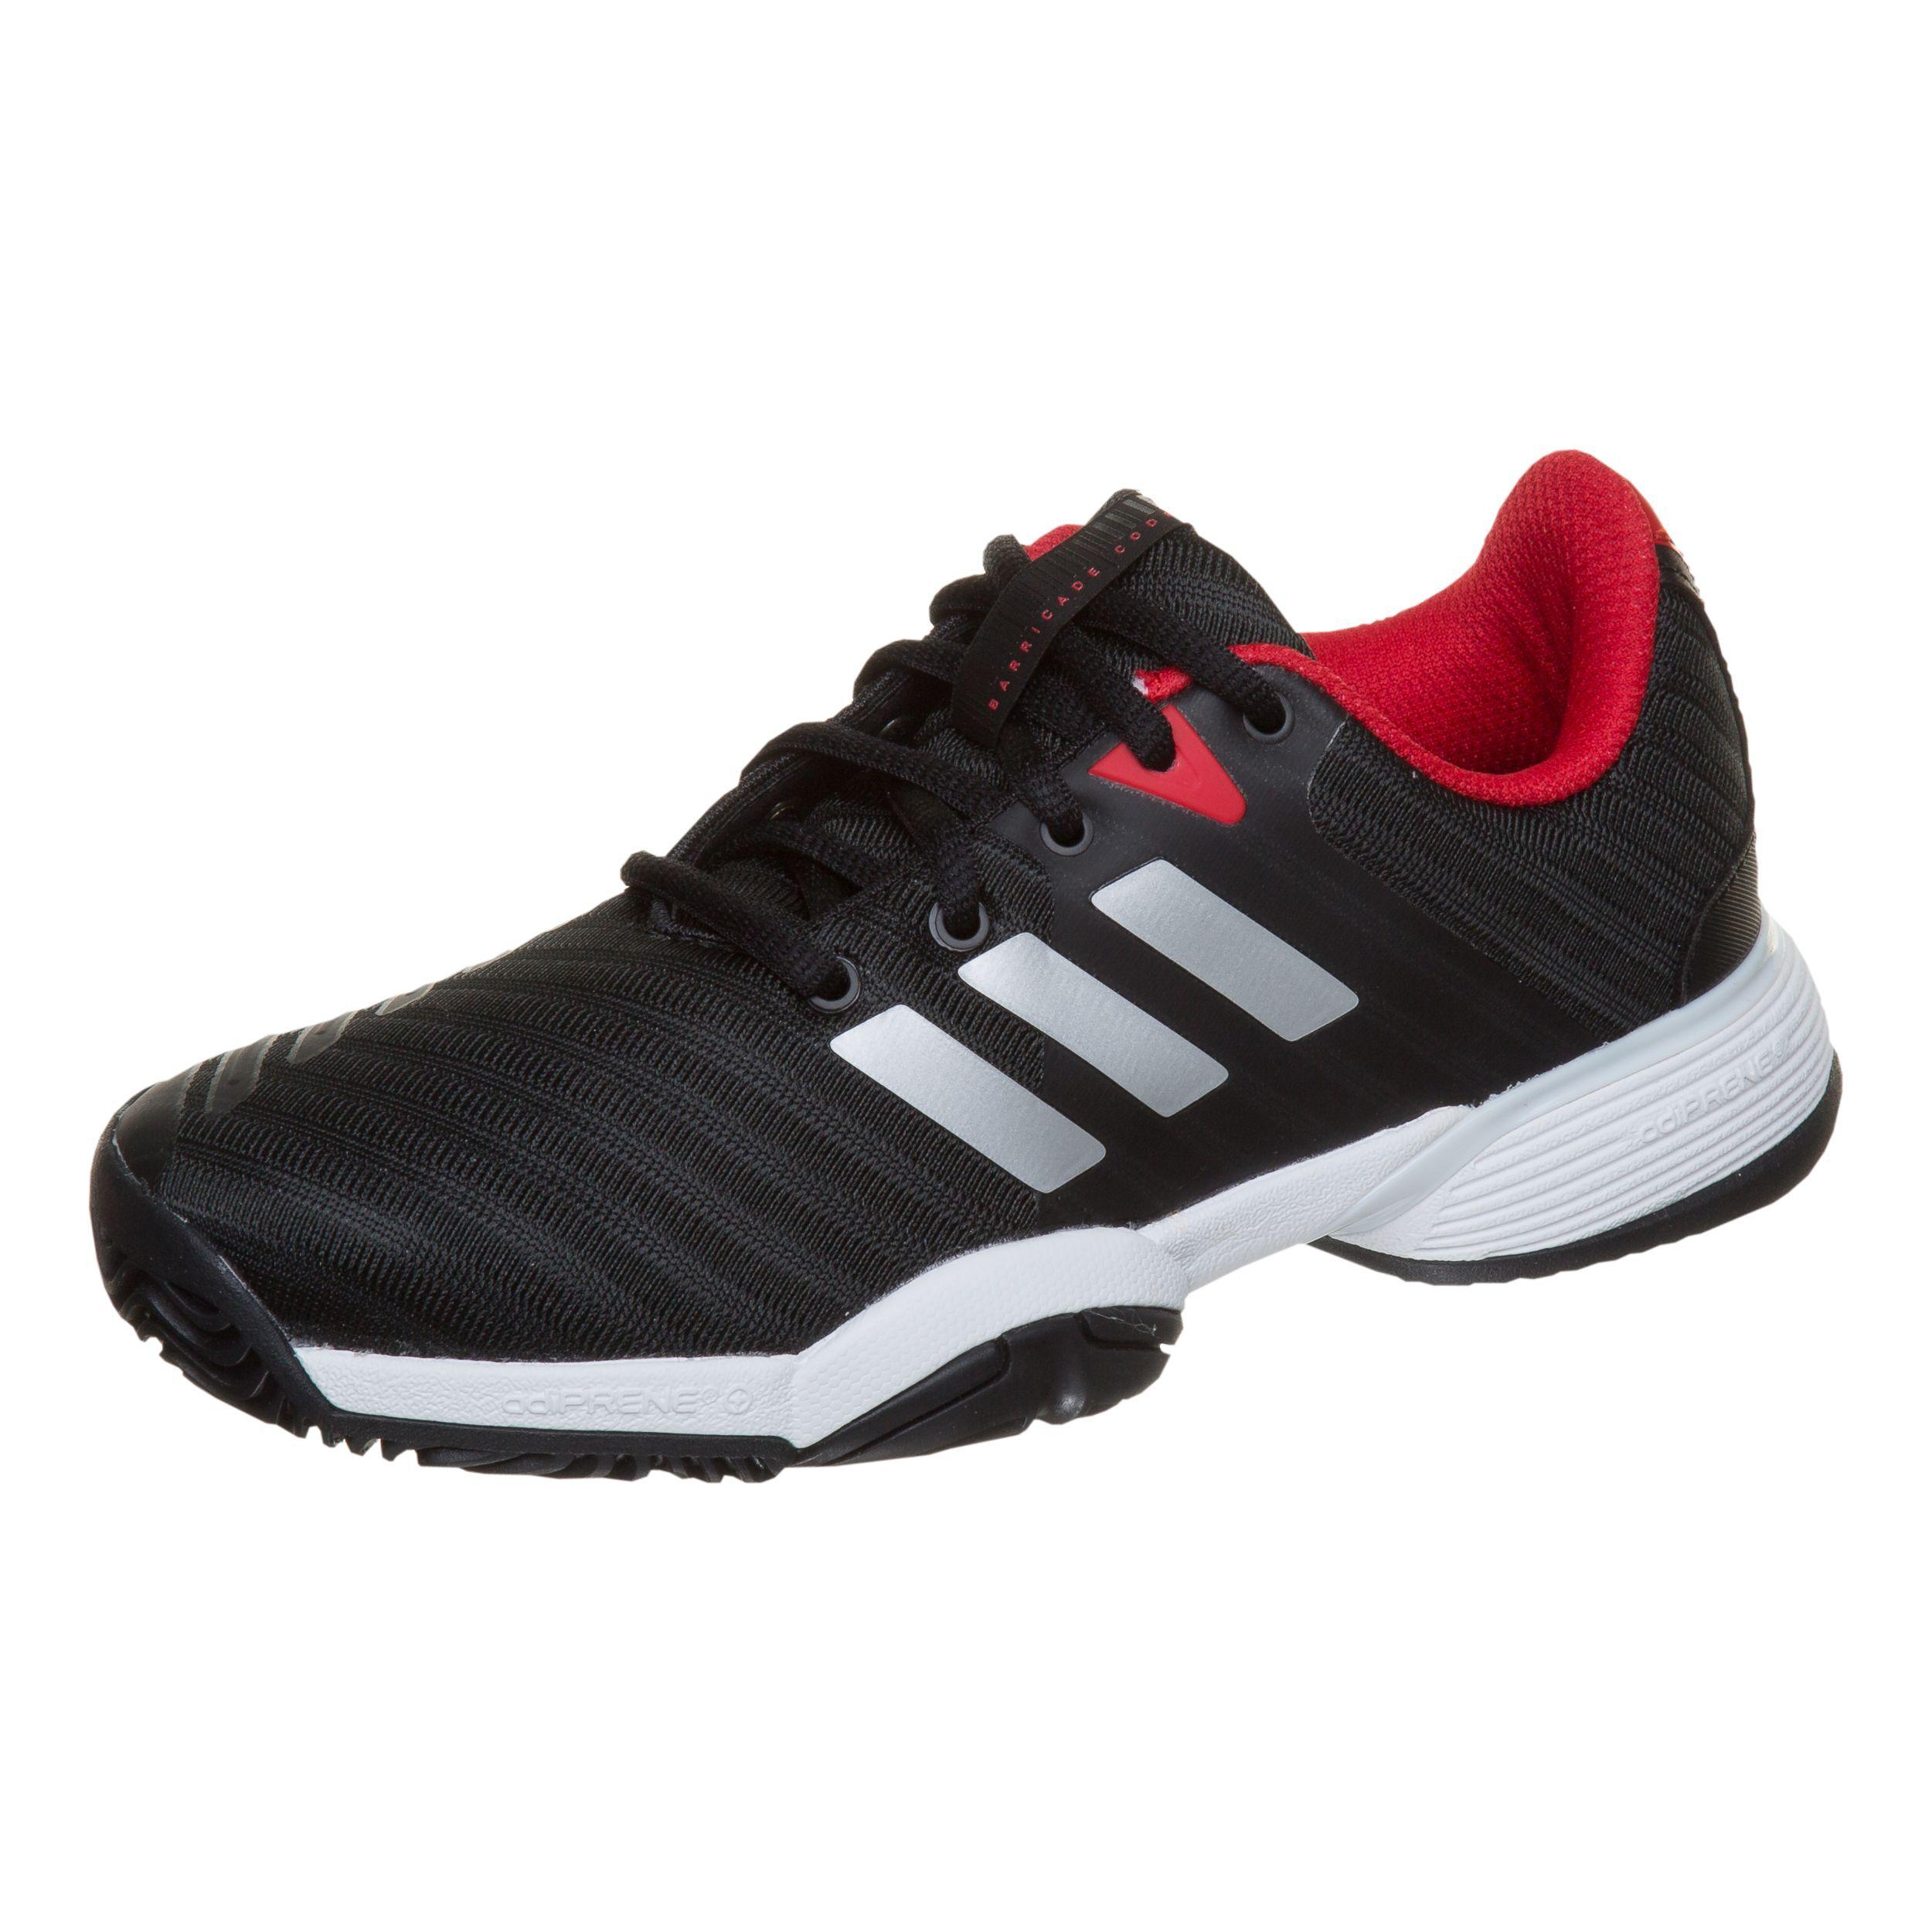 adidas Barricade 2018 XJ All Court Shoe